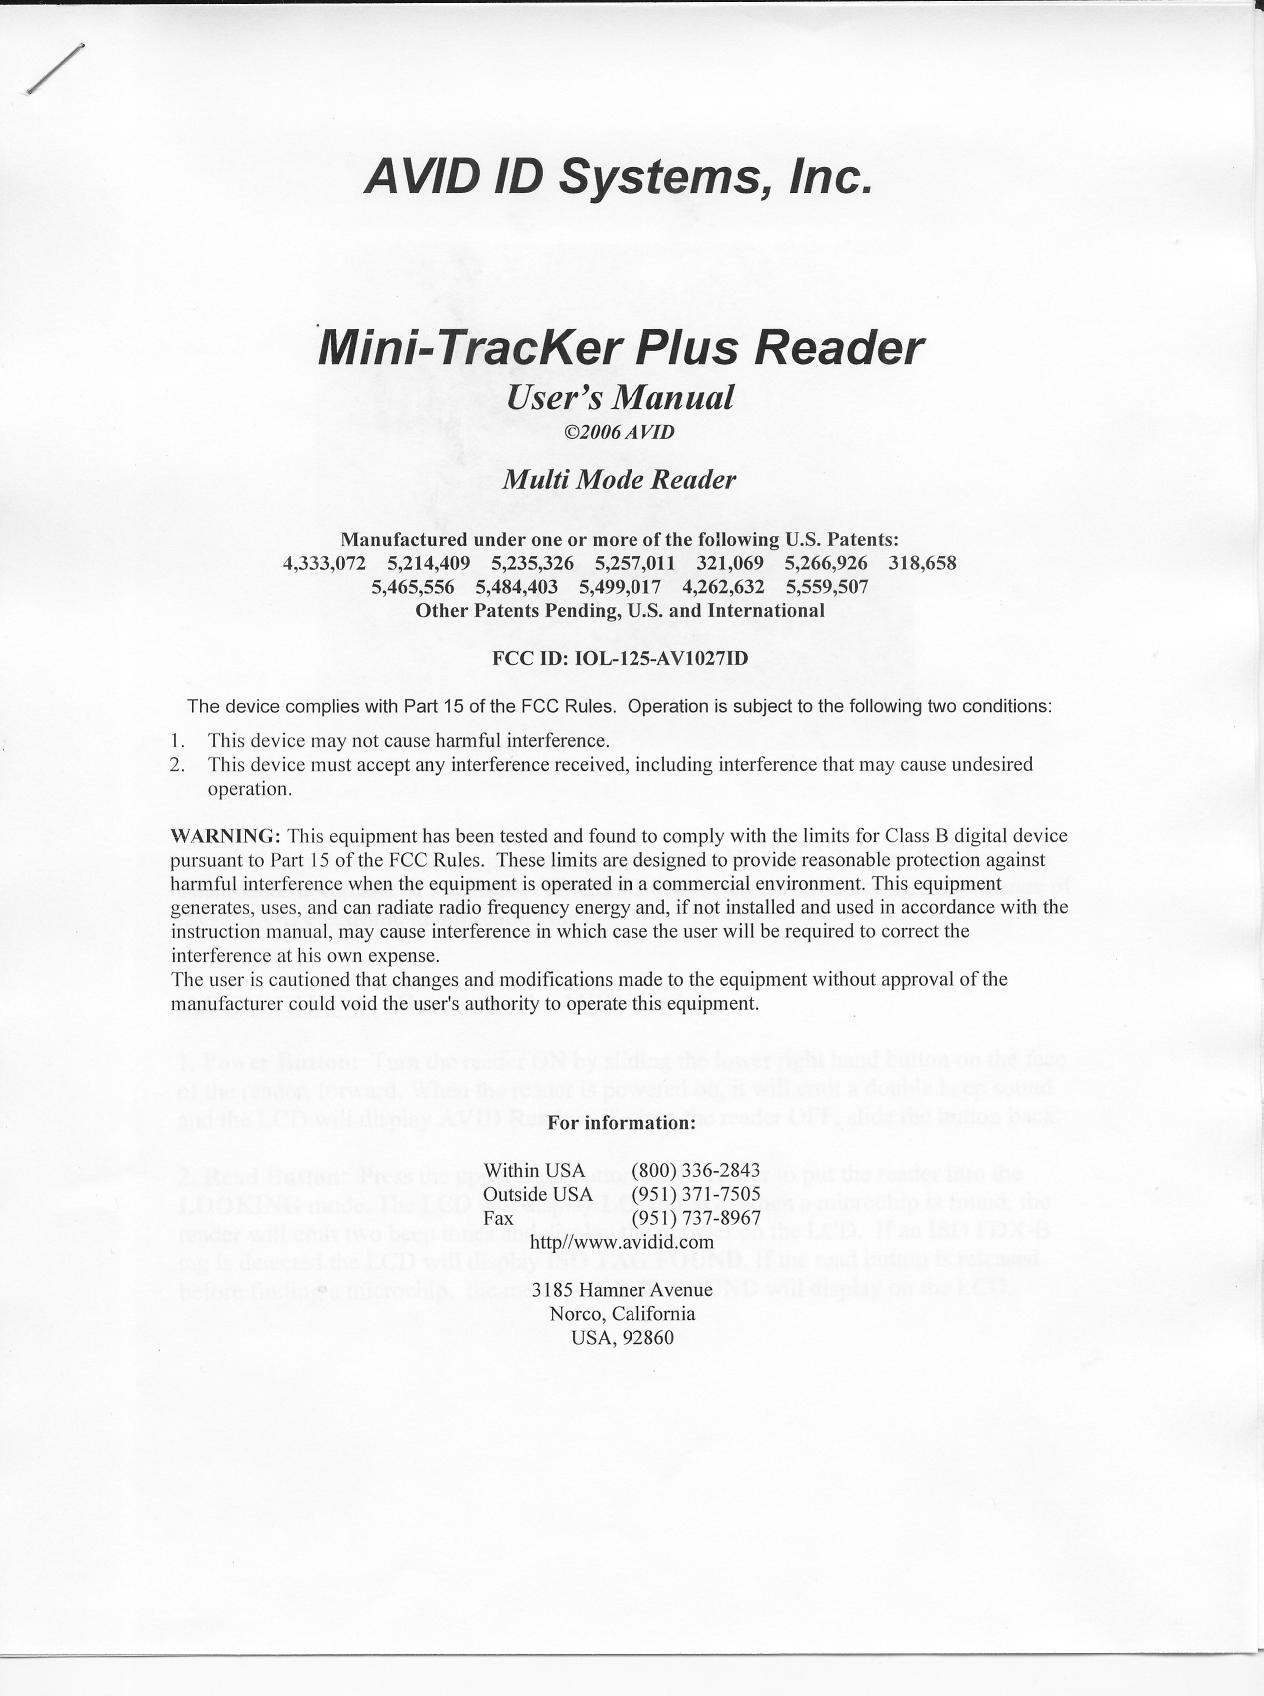 Avid manual array avid id systems 125 av1027id rf id reader user manual rh usermanual wiki fandeluxe Image collections